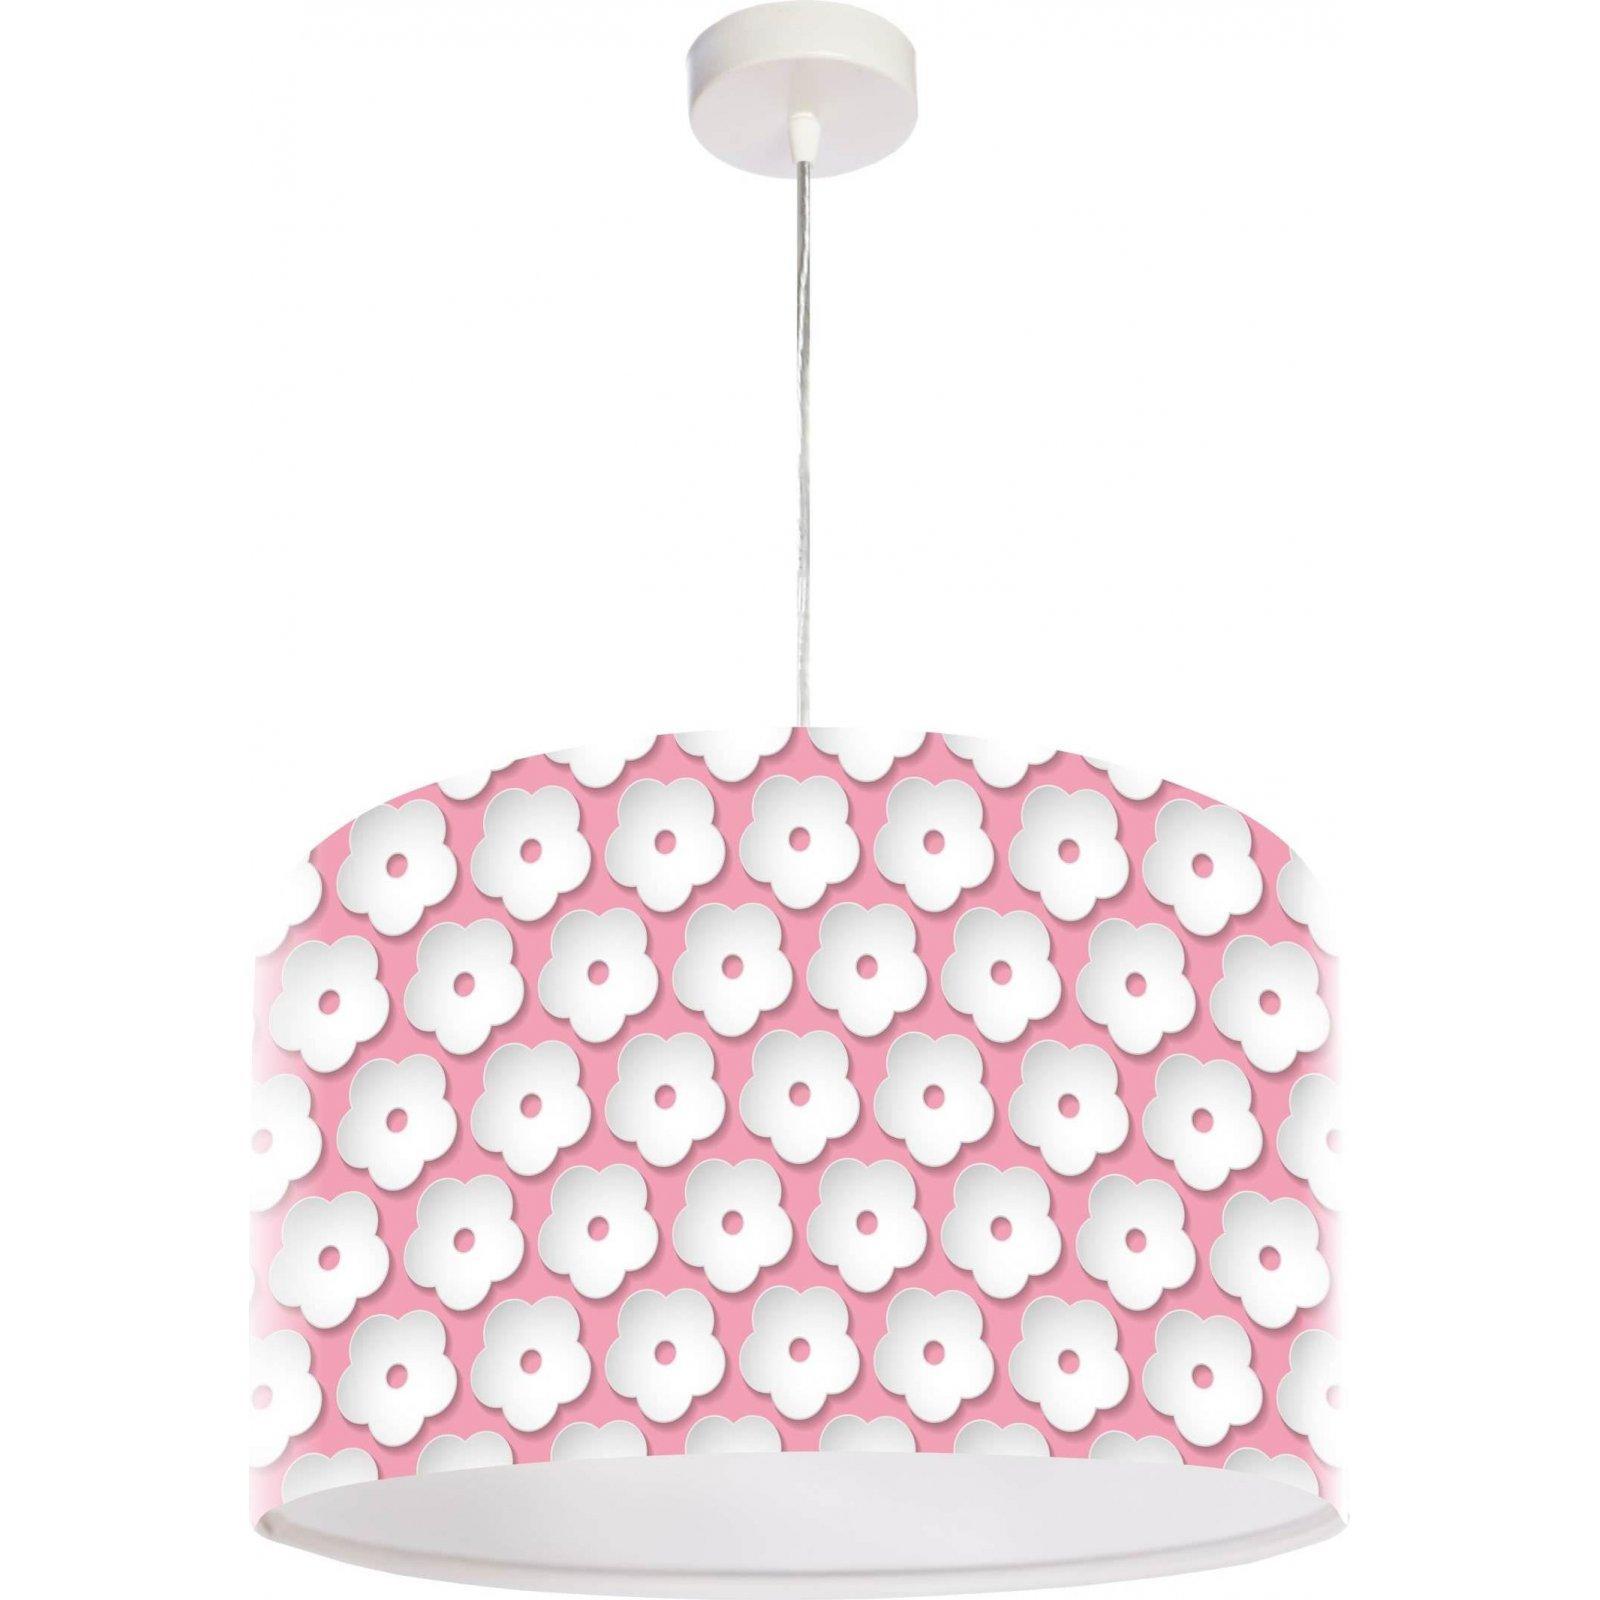 Suspension enfant abat-jour tissu rose et blanc Ø 30